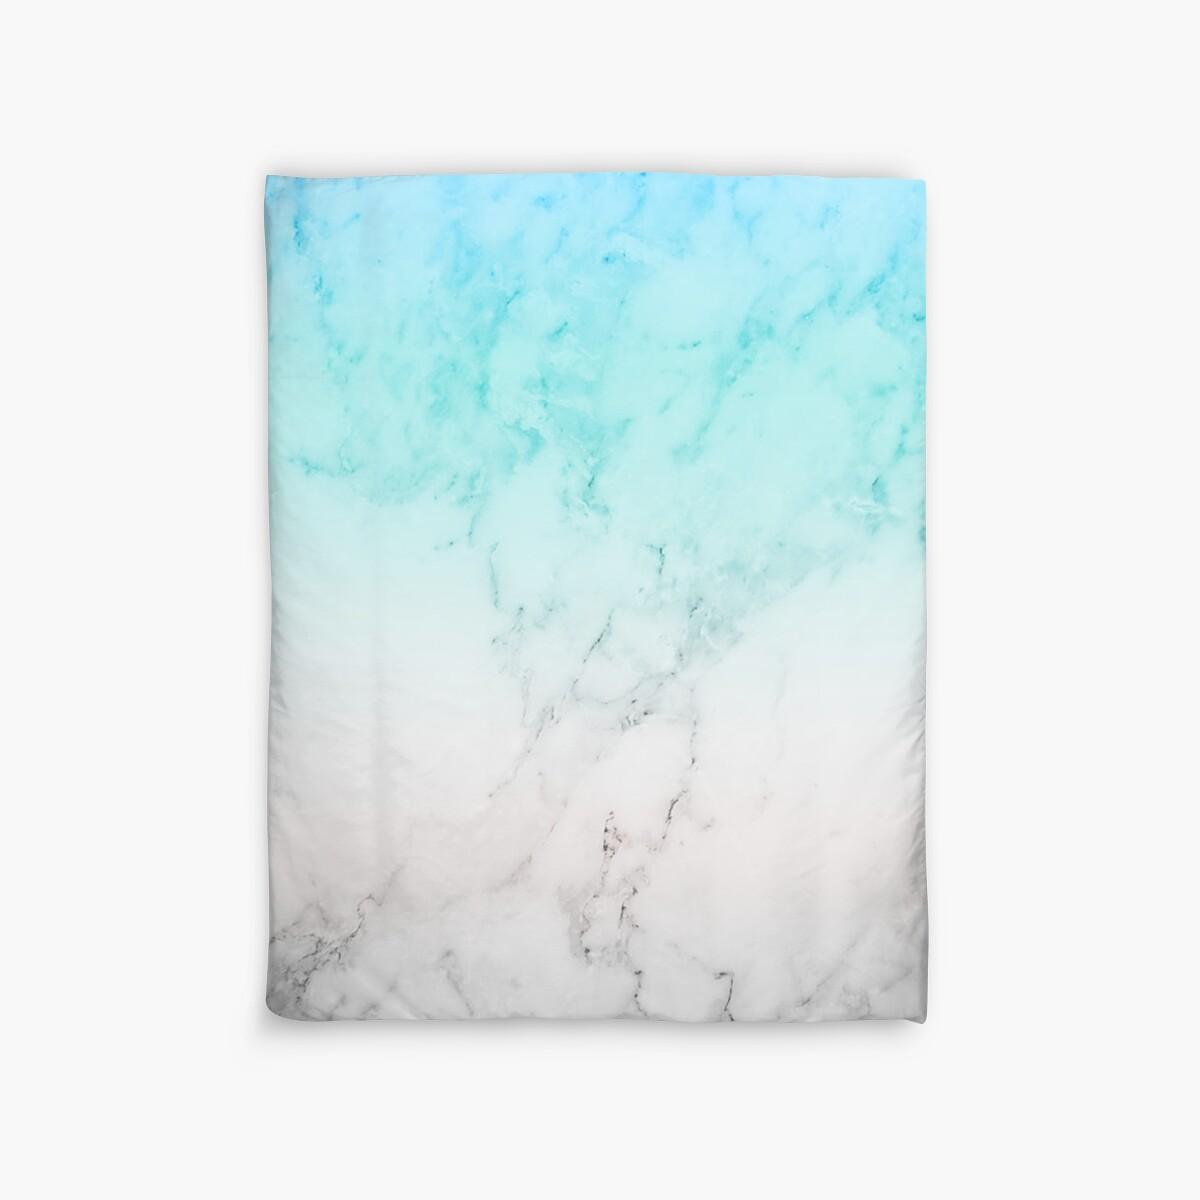 Good Wallpaper Marble Aesthetic - dc,1200x1200,twin,flat  Photograph_23387.jpg